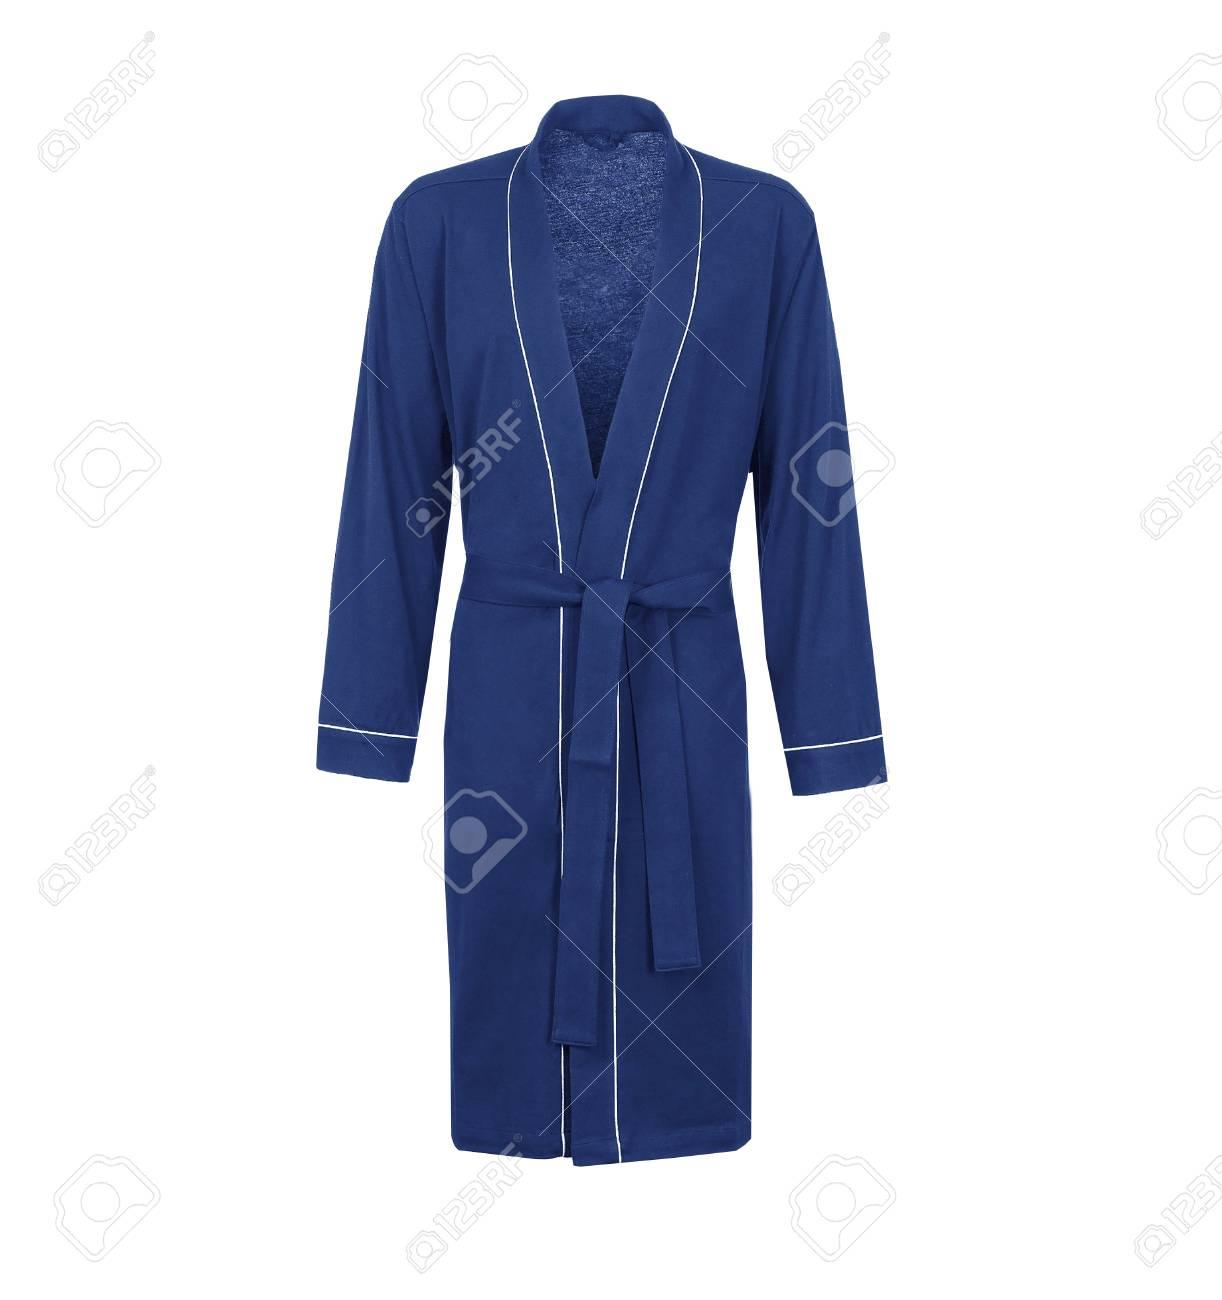 Blue Bathrobe Isolated Male Housecoat On White Background Stock Photo Picture And Royalty Free Image Image 104302521